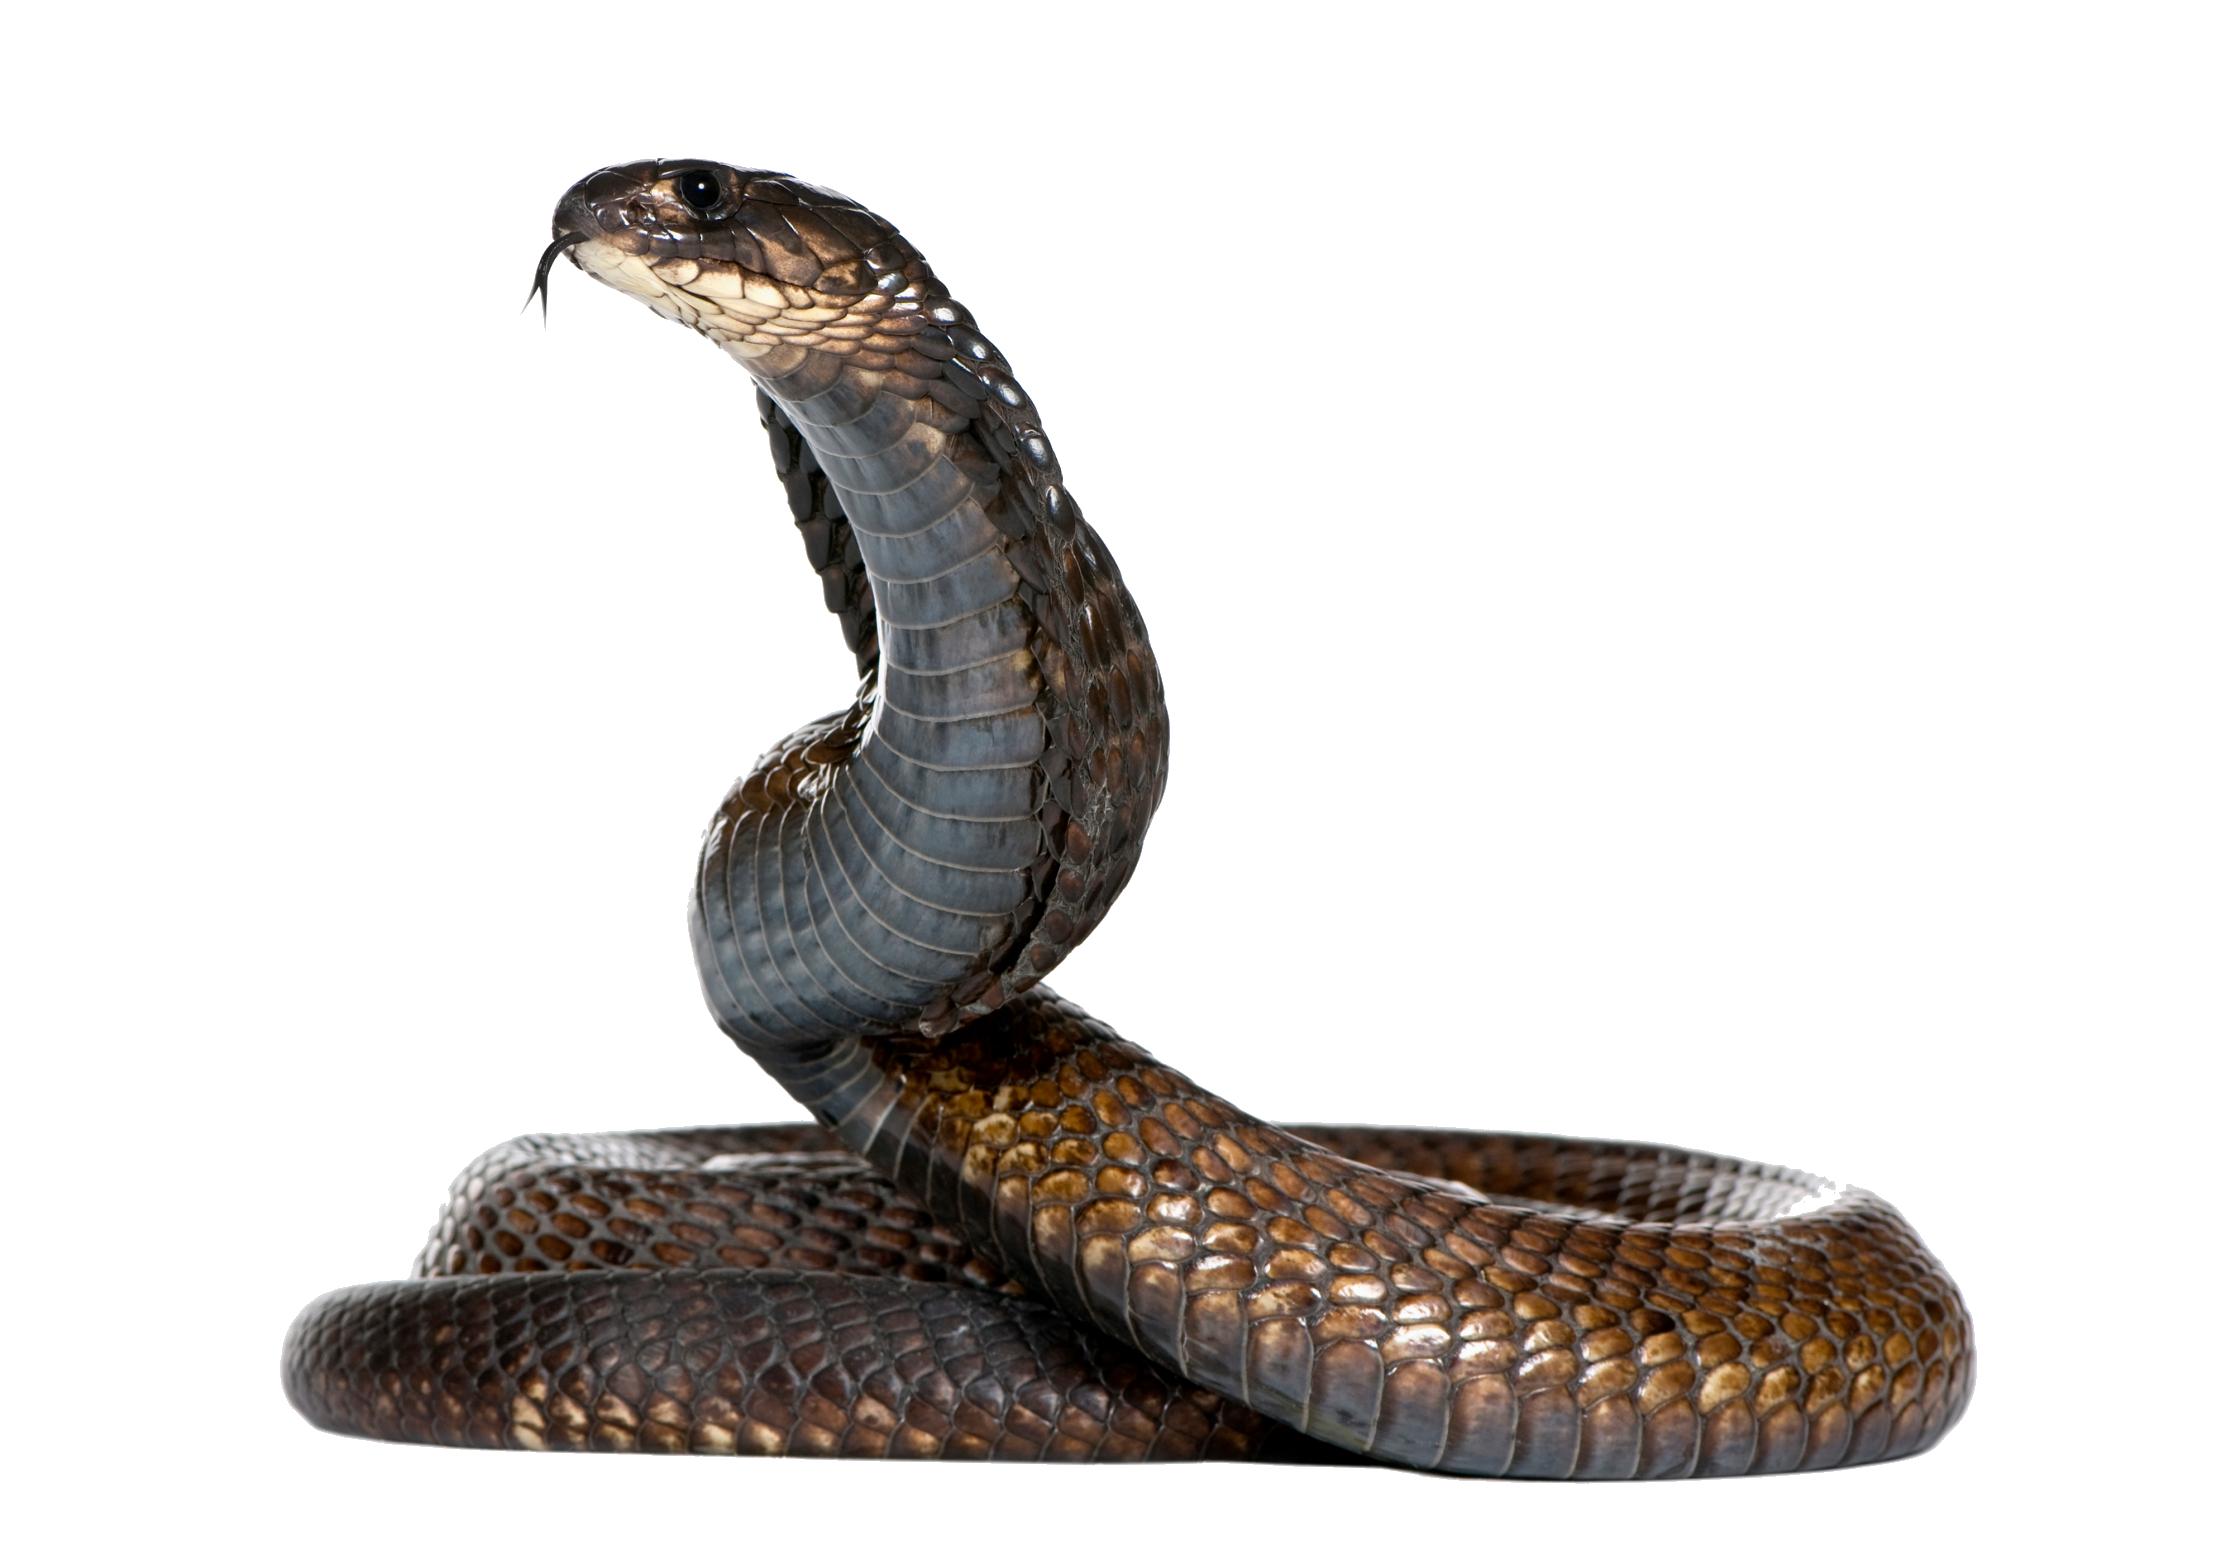 Snake PNG Image